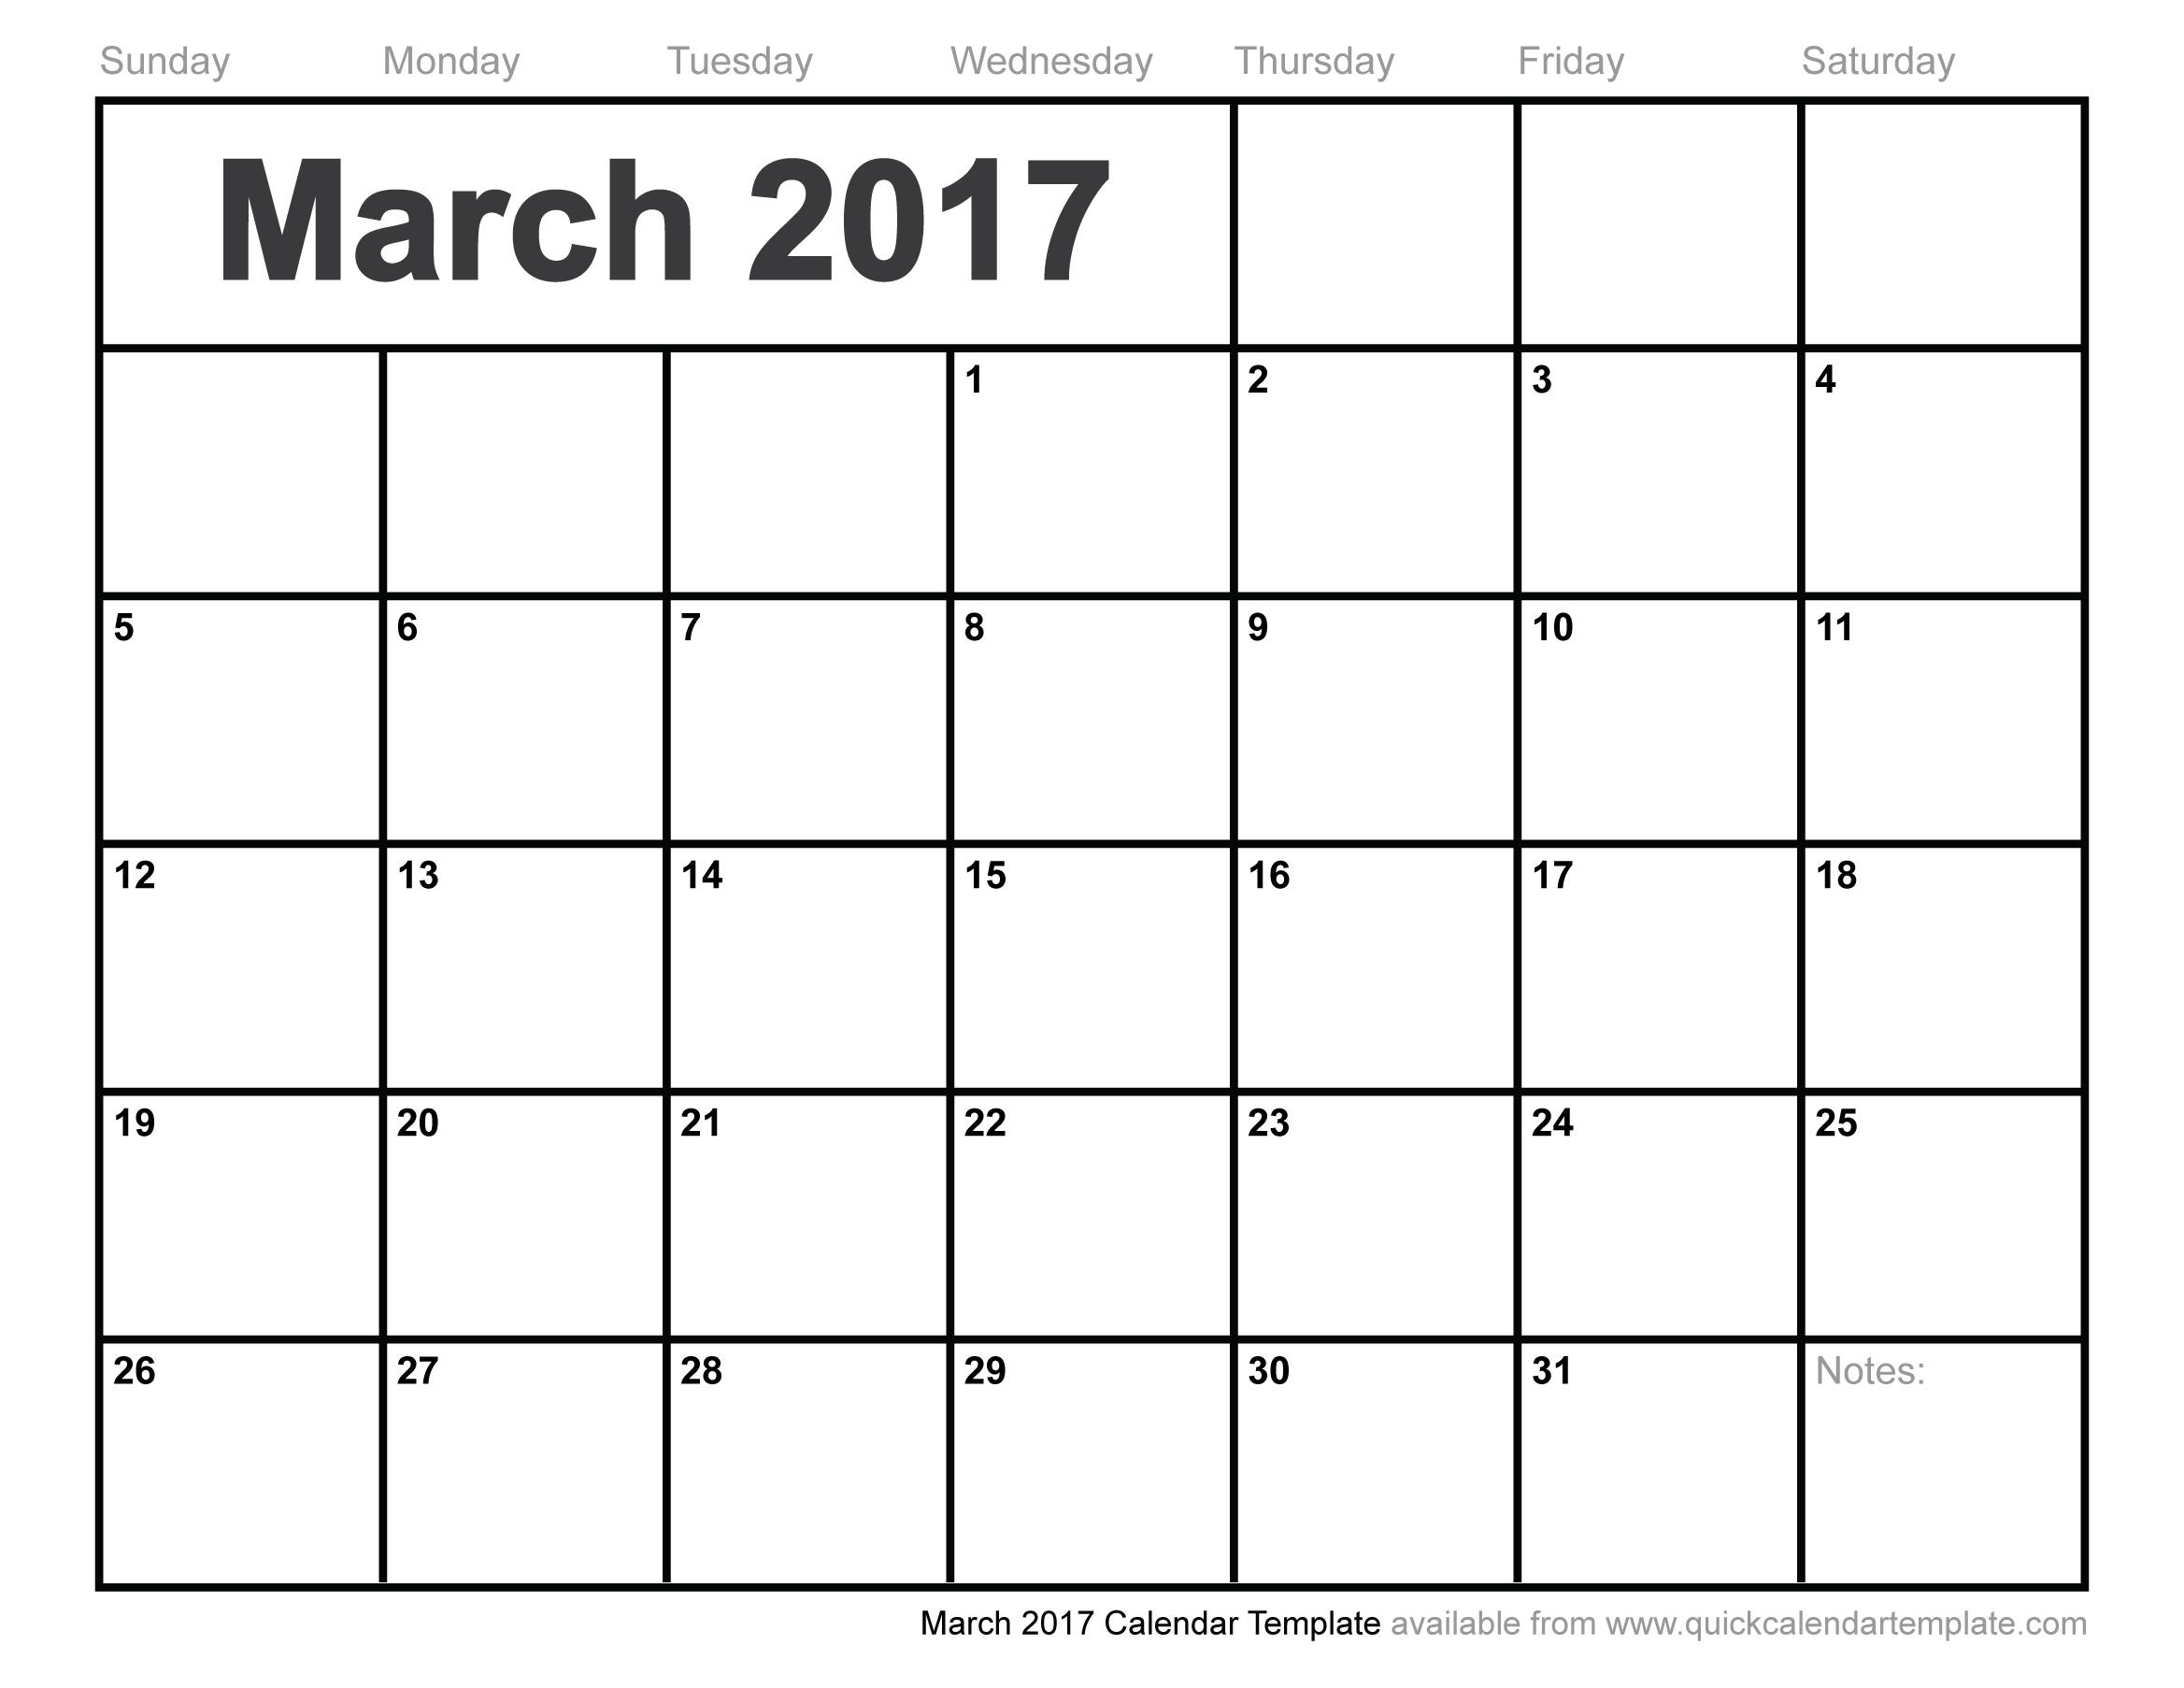 2017 March Calendar Commonpenceco 89uj